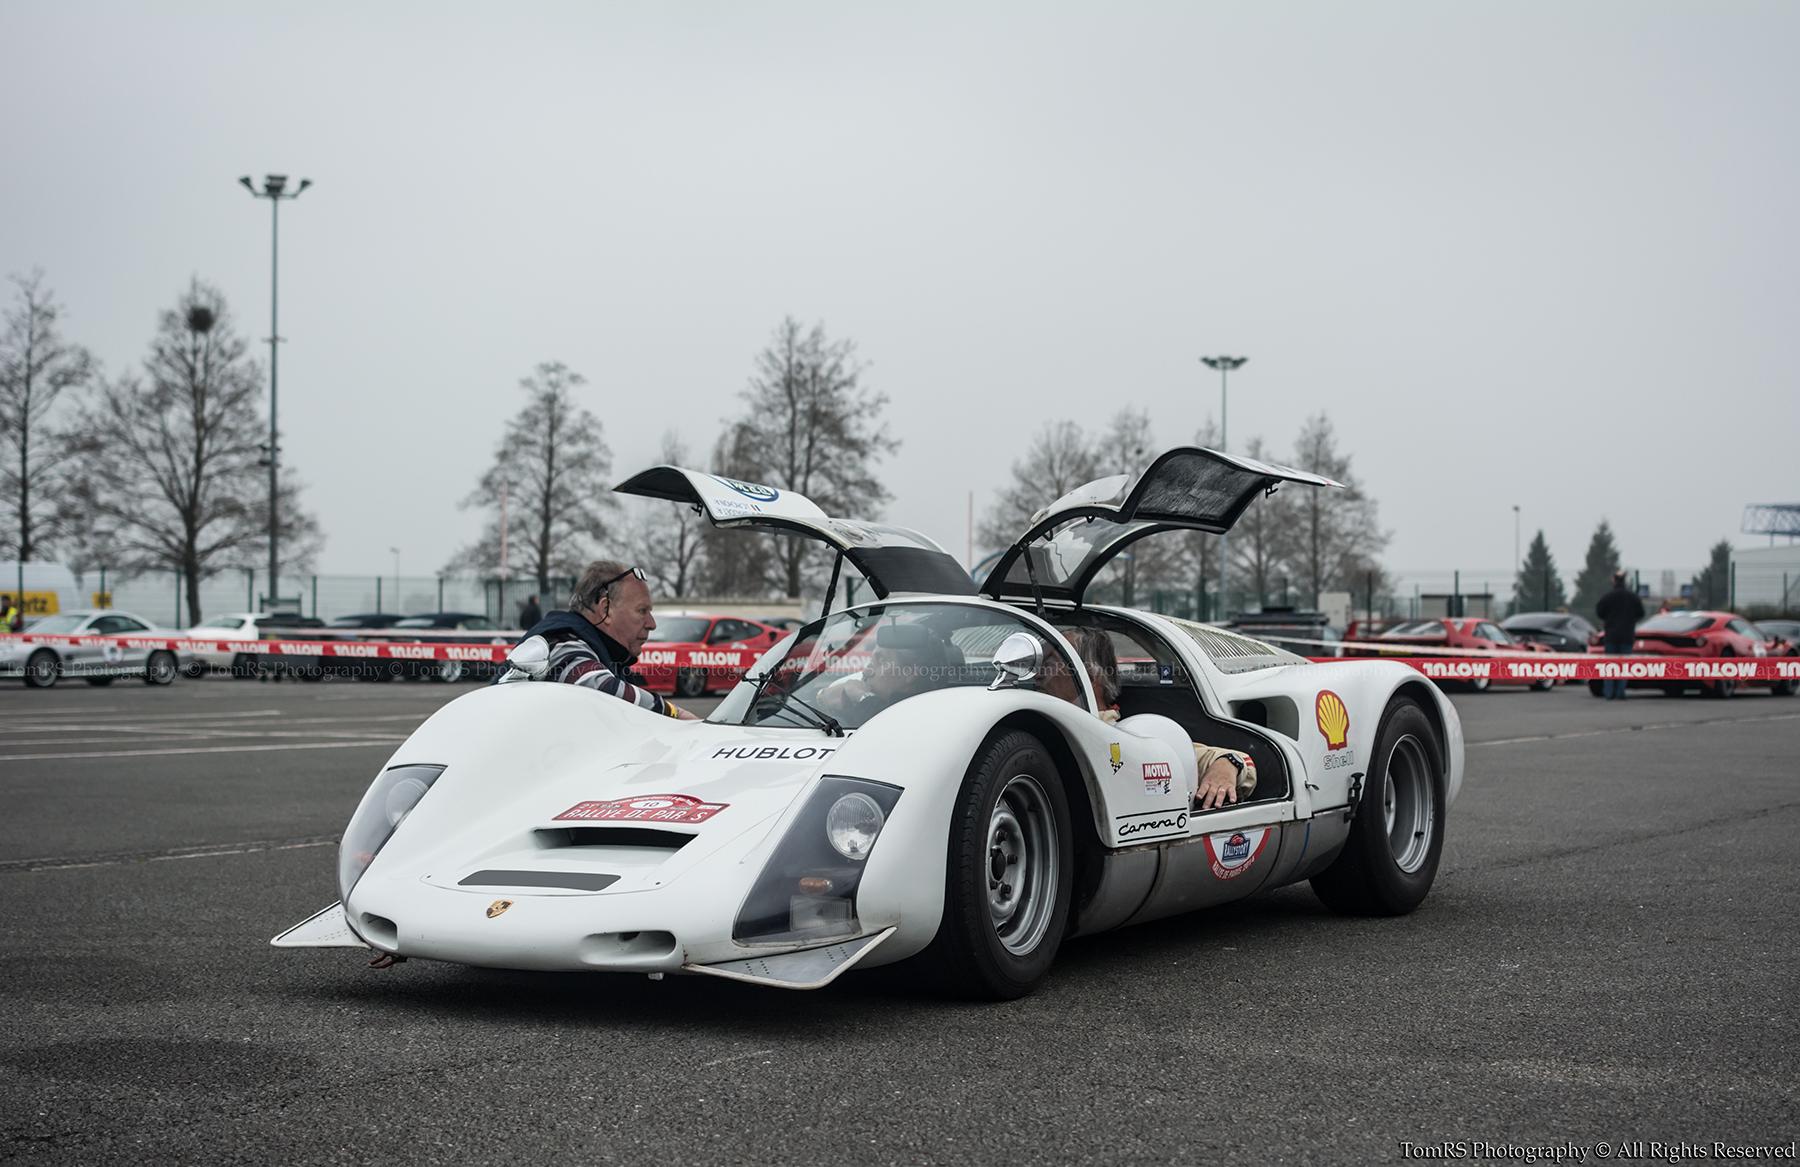 Wallpaper : old, street, love, vehicle, supercars, Porsche ...